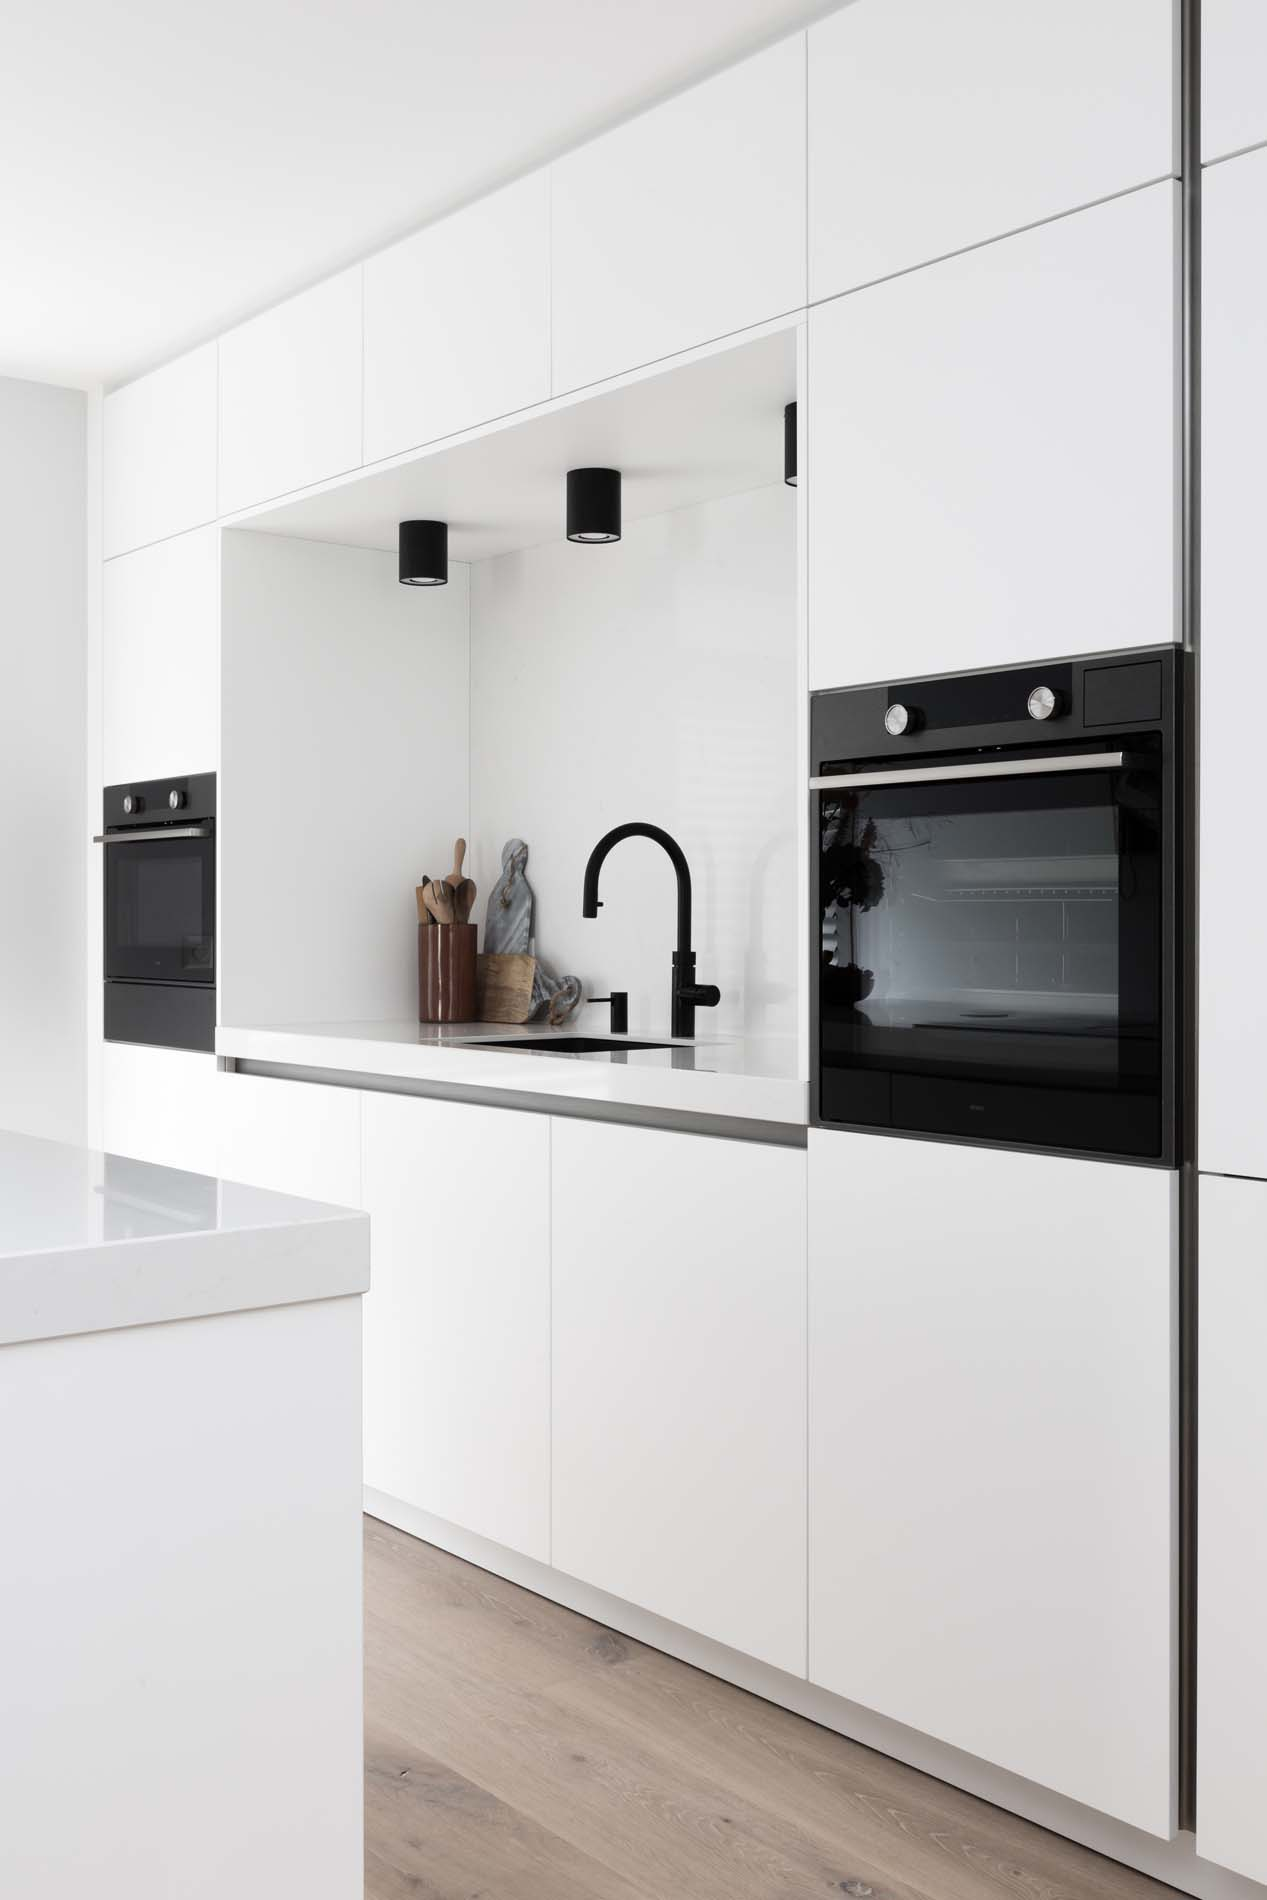 vtwonen keuken met ATAG apparatuur, Keukenapparatuur ASWA Keukens